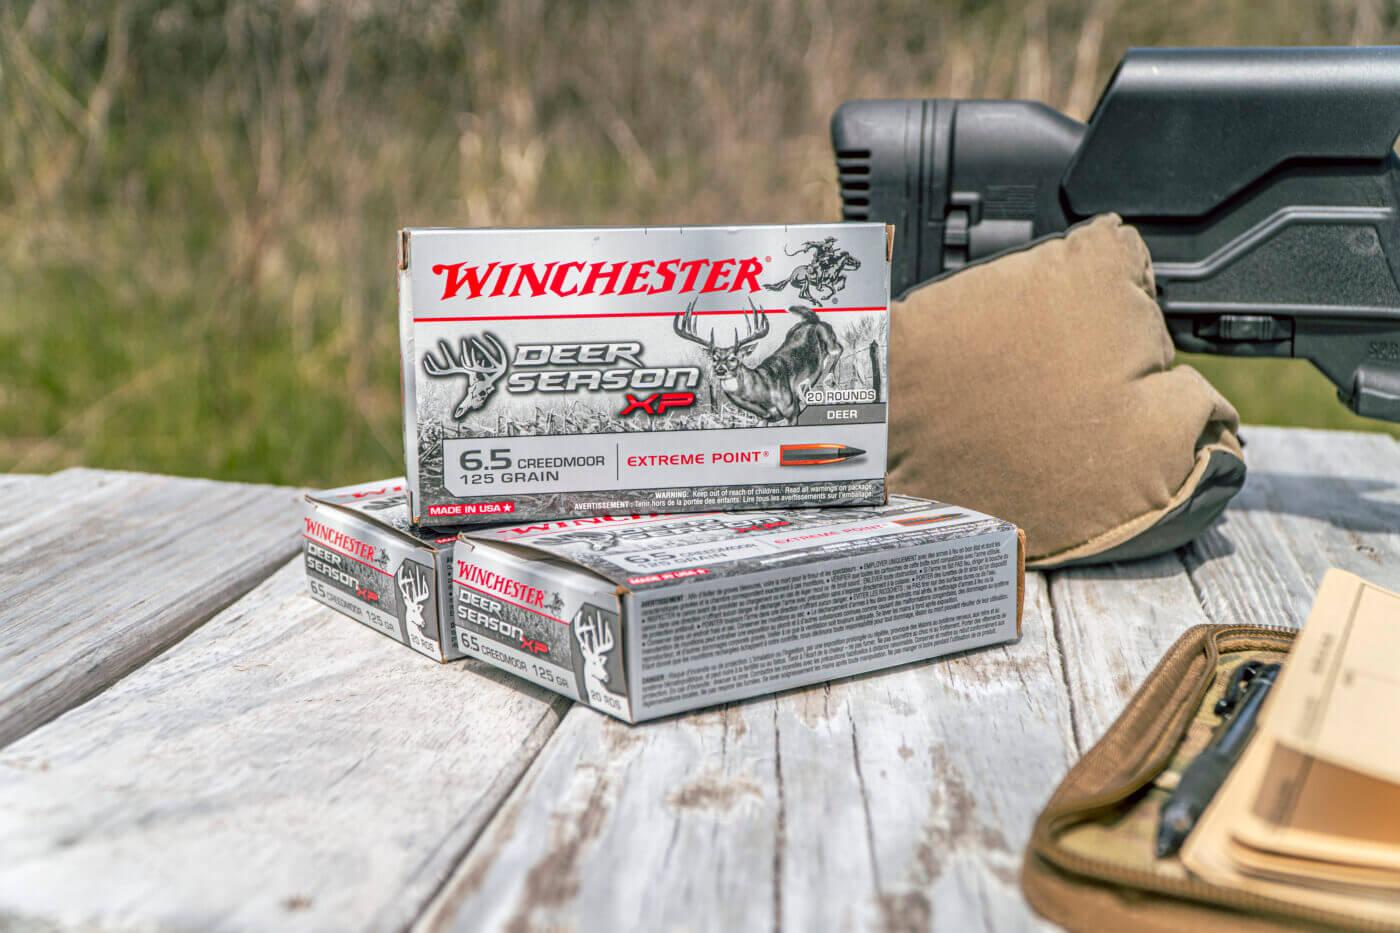 Winchester Deer Season XP on table